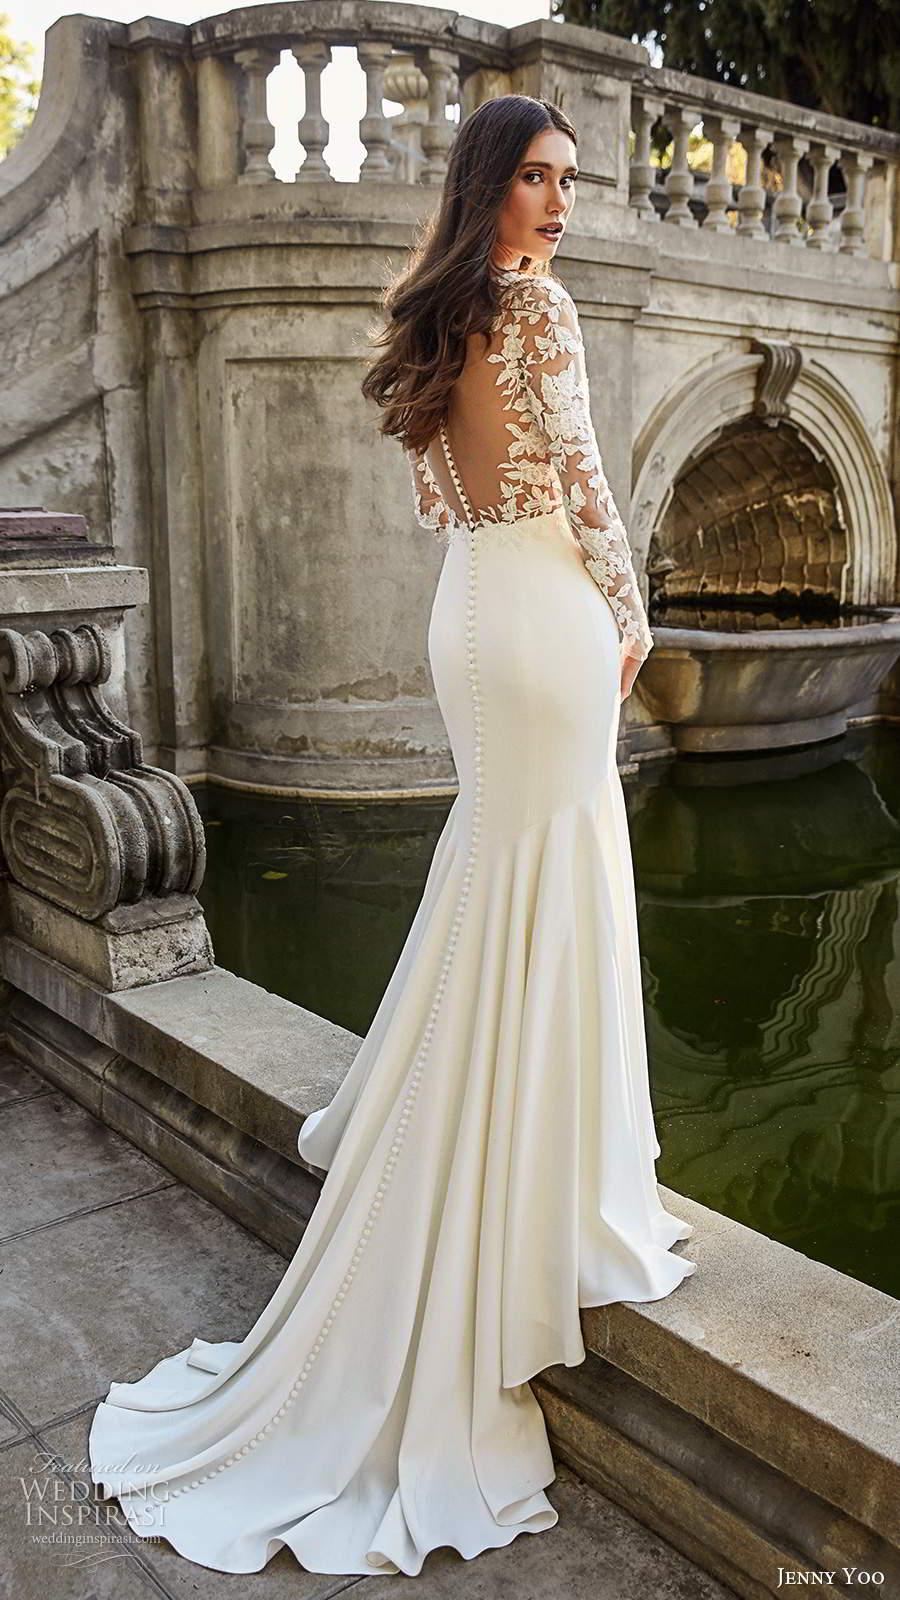 jenny yoo spring 2020 bridal illusion long sleeves plunging v neckline sheer embellished bodice clean skirt fit flare mermaid wedding dress chapel train (8) bv